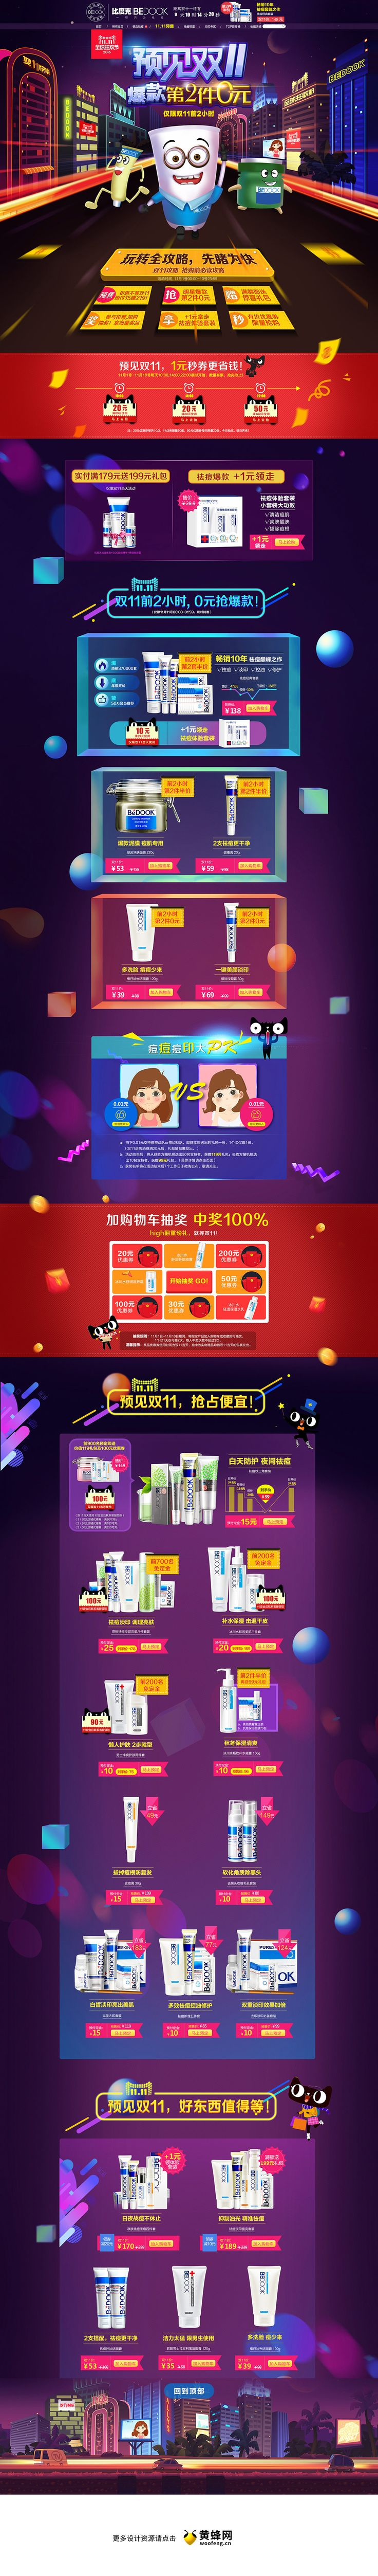 bedook化妆品美妆美容洗护美发护肤天猫双11预售双十一预售首页页面设计 更多设计资源尽在黄蜂网http://woofeng.cn/